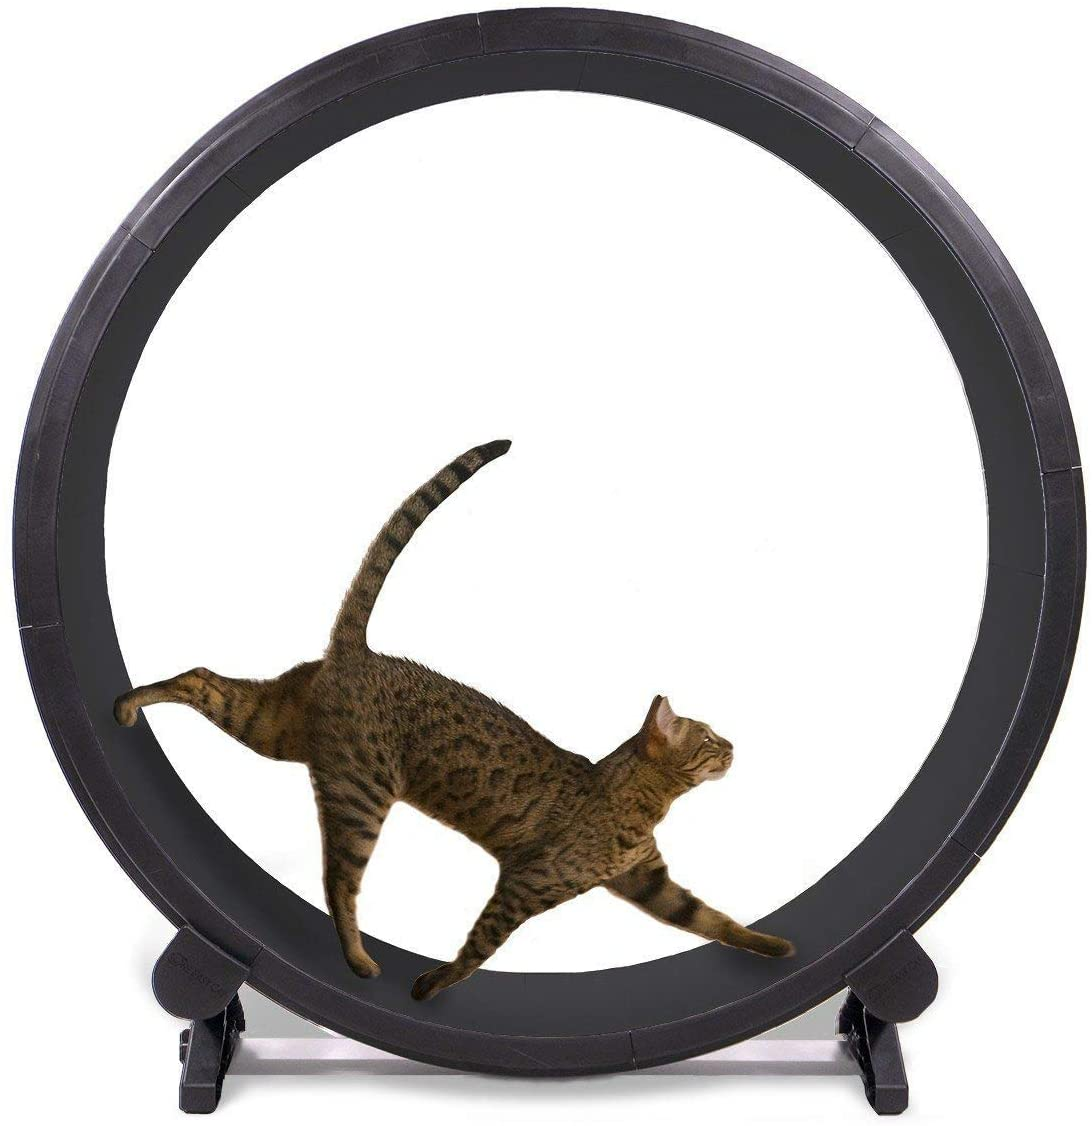 One Fast Cat Exercise Wheel - Black